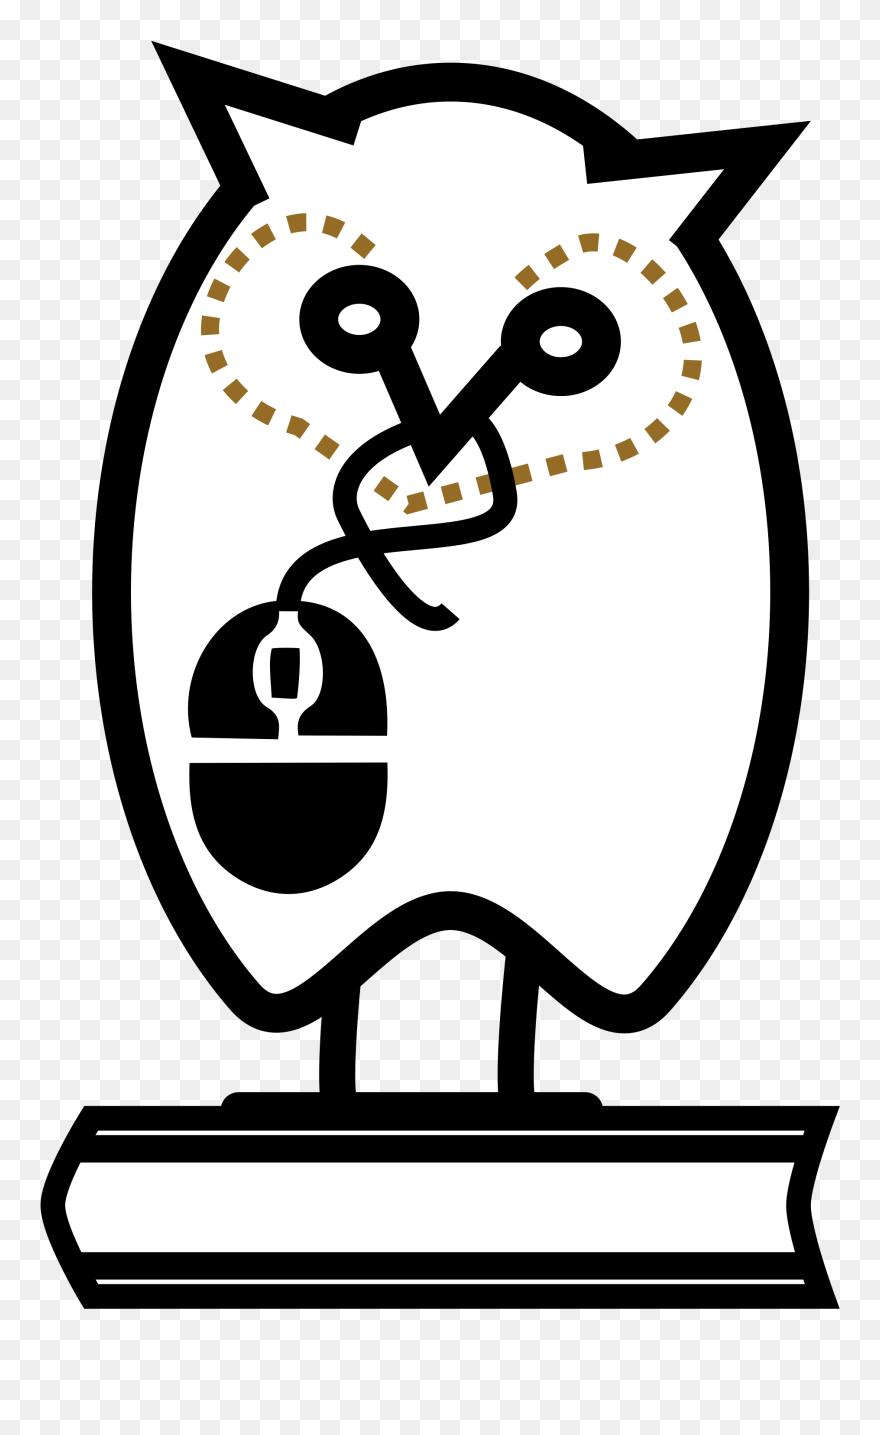 Px Wikipedia Library Owl Svg - 1lib1ref Clipart (#5351759 ...